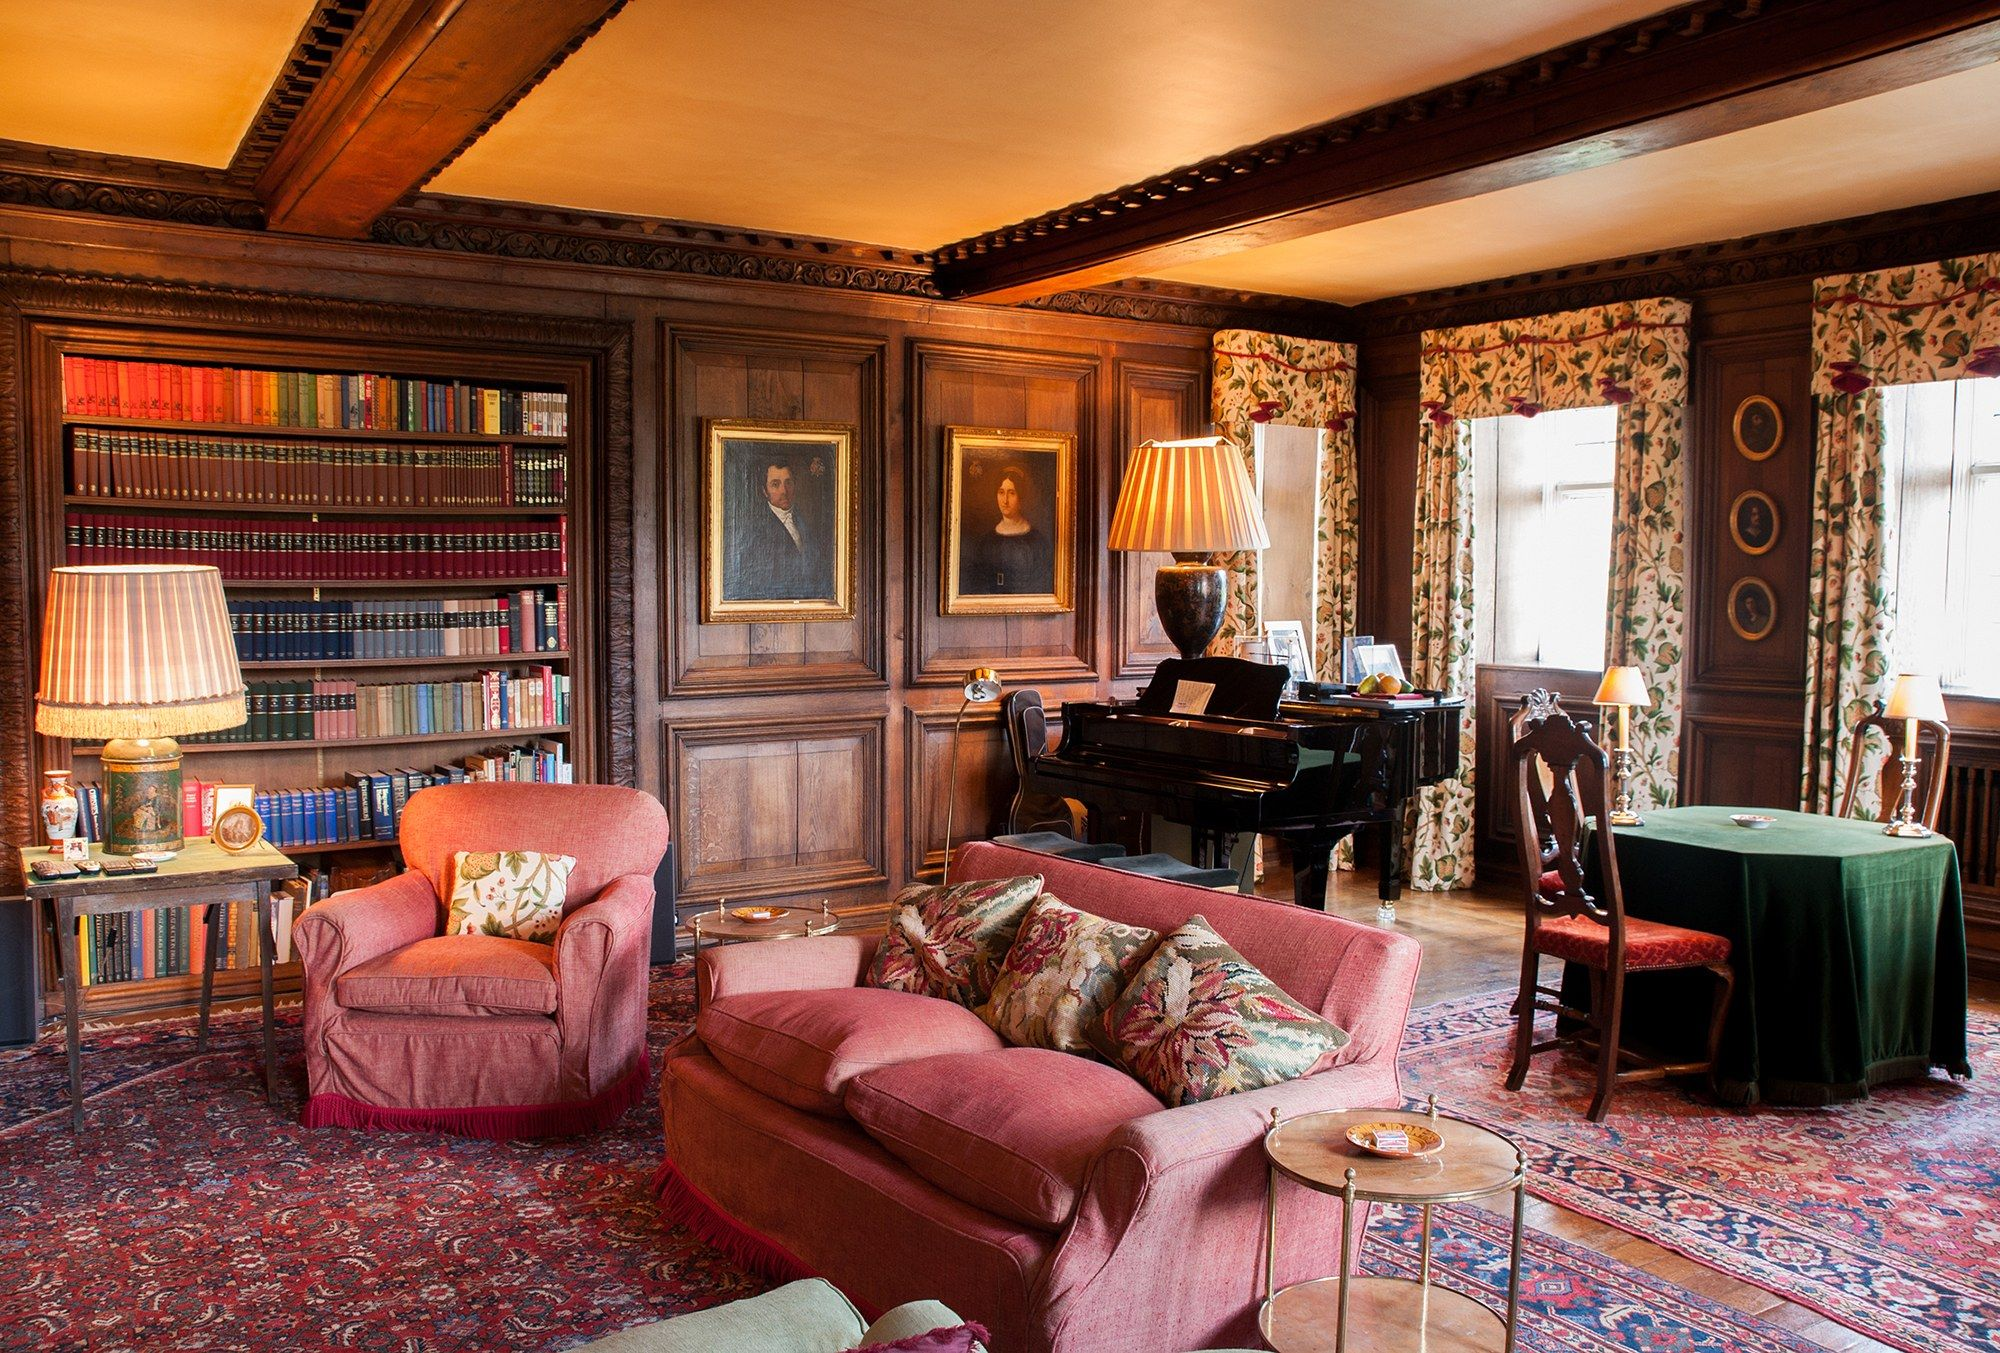 Fullsize Of Country Style Homes Inside